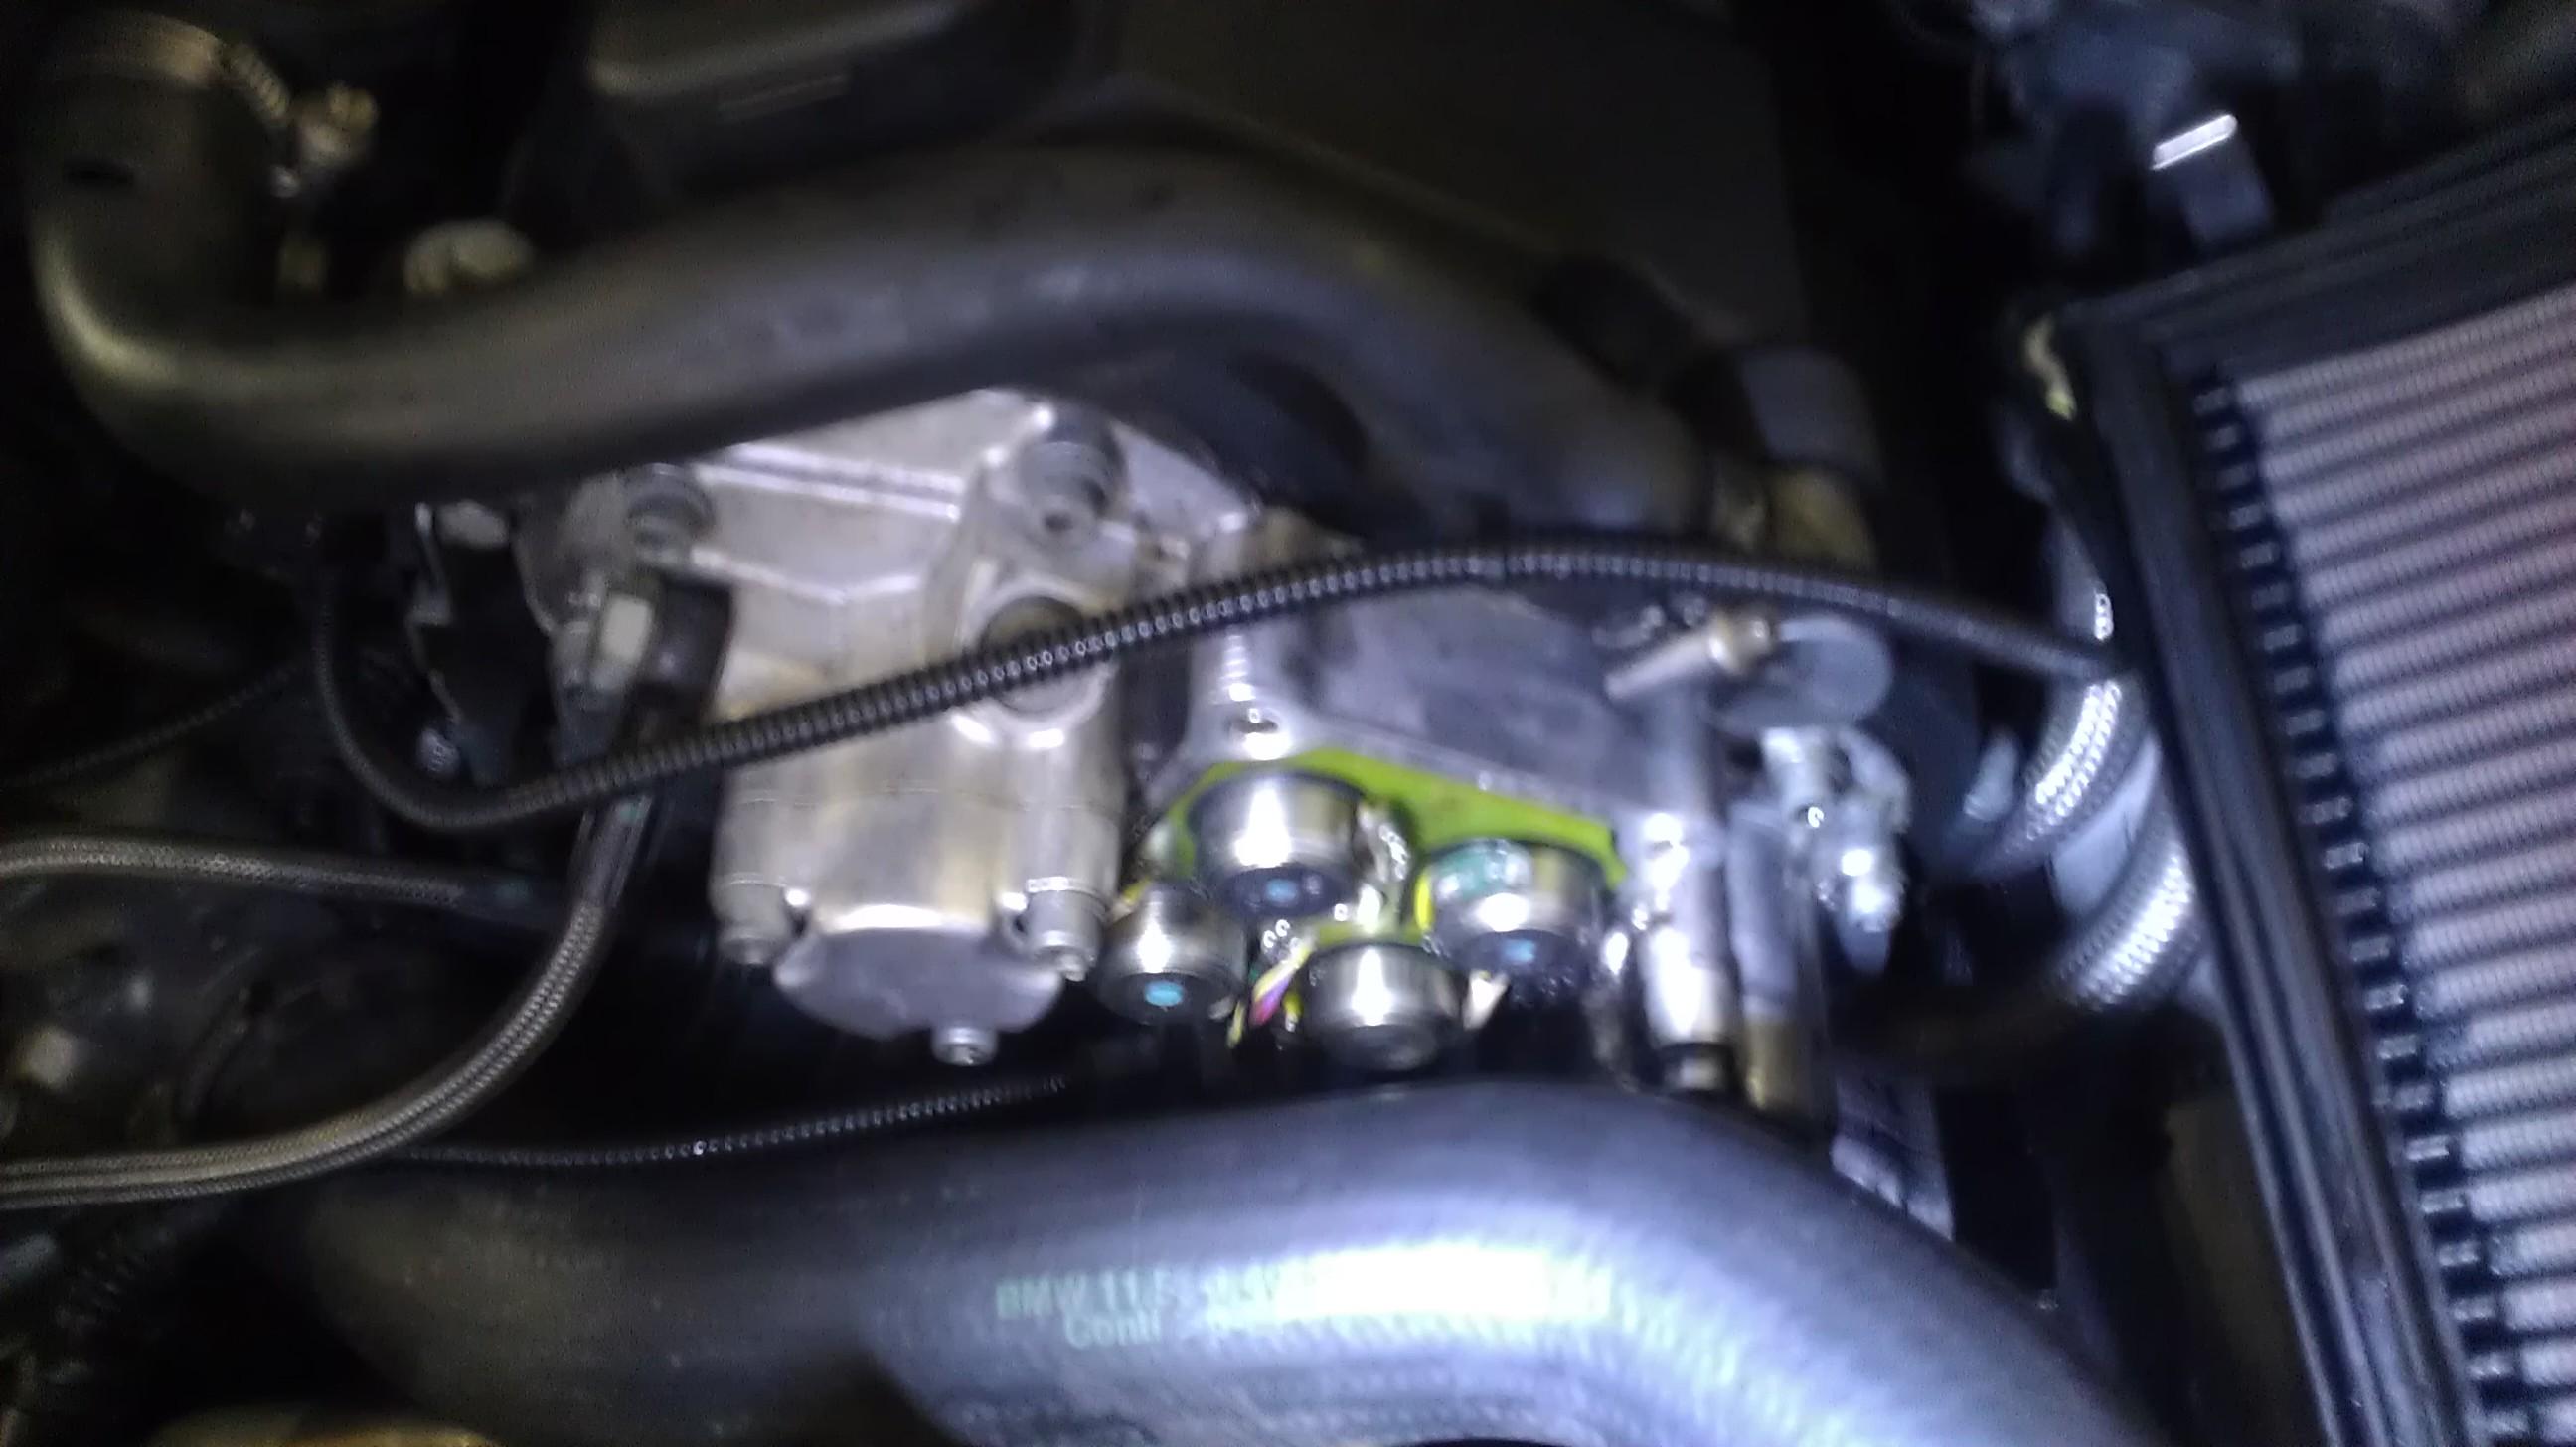 RennsportKC::BMW M5 dreaded vanos problems - RennsportKC::